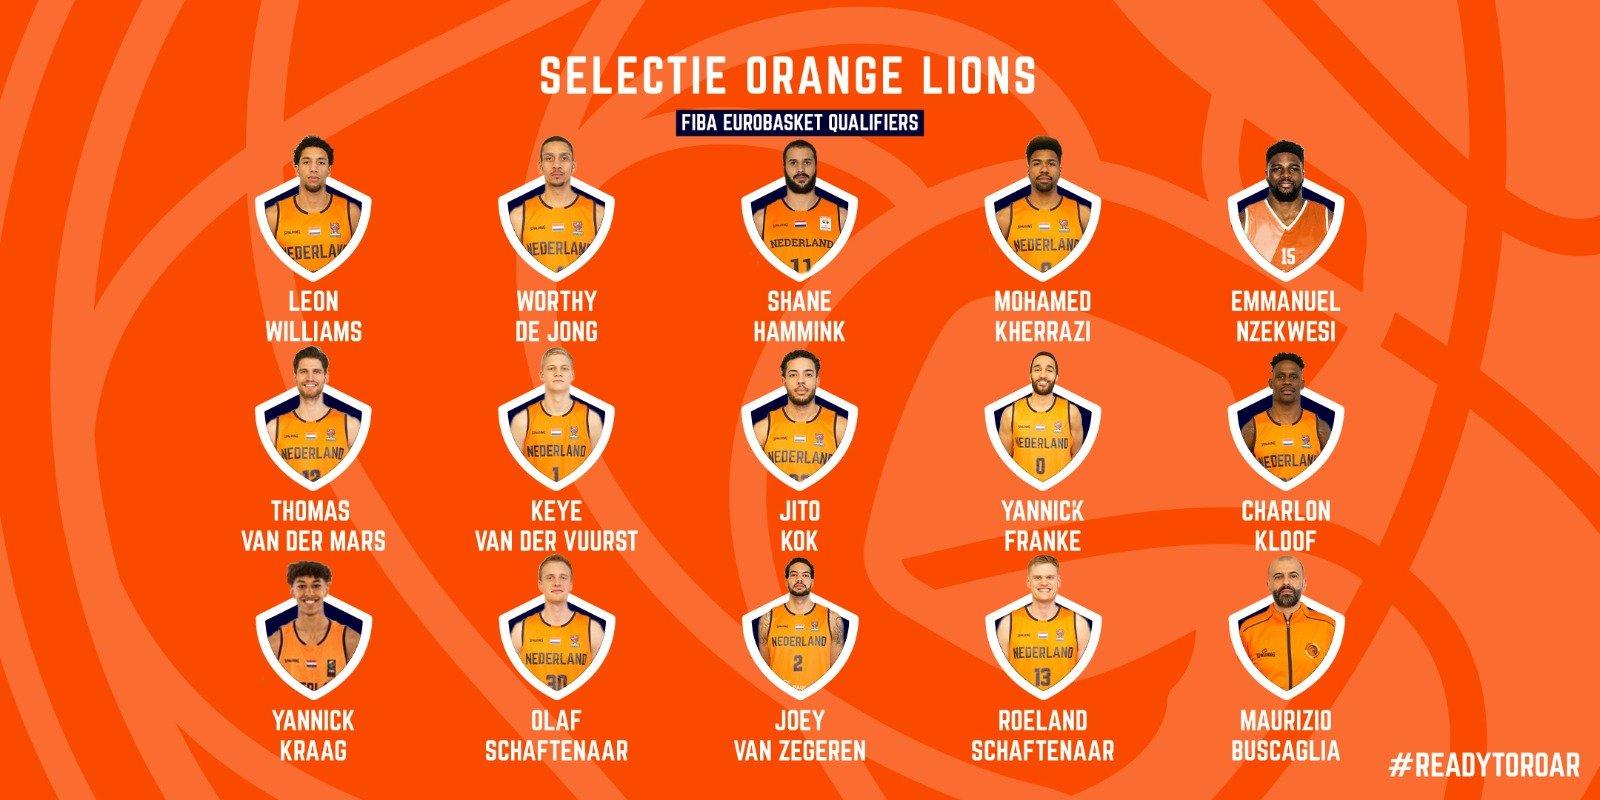 Selectie Orange Lions Turkije.jpeg